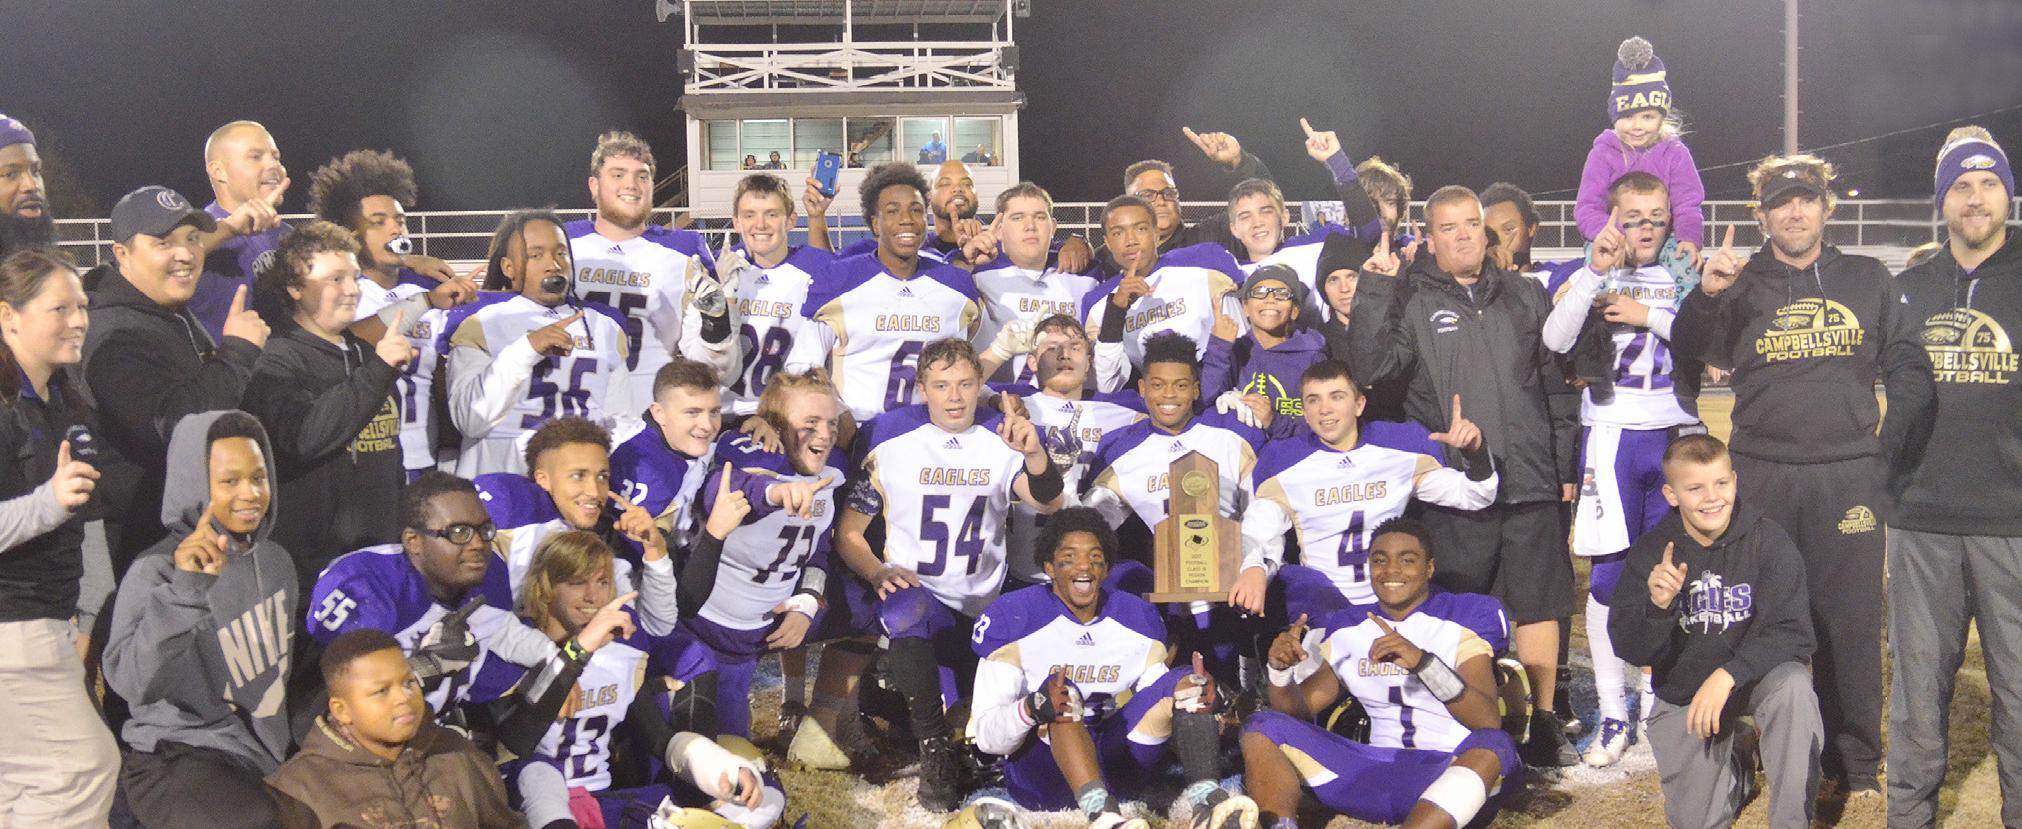 CHS football team wins region championship